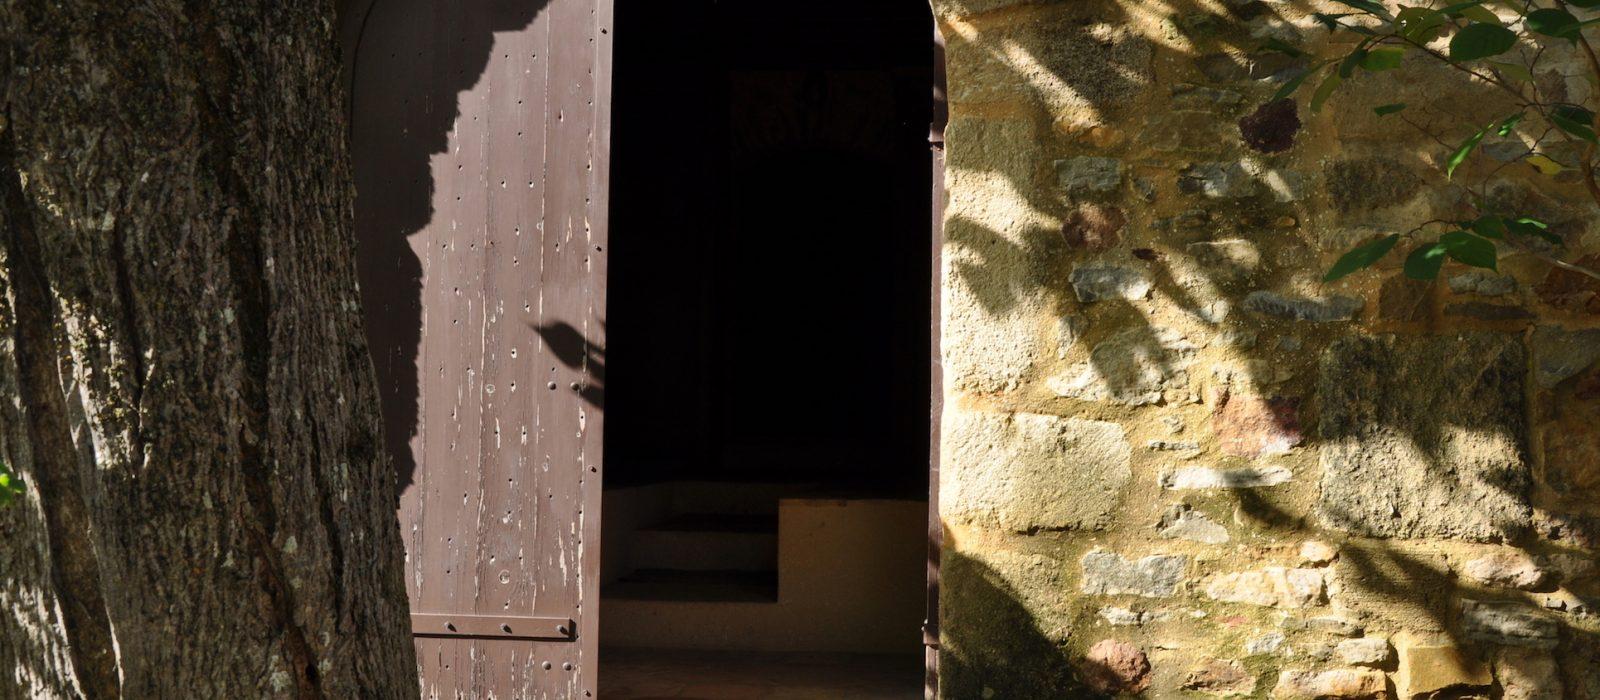 porte ouverte du monastère de solin